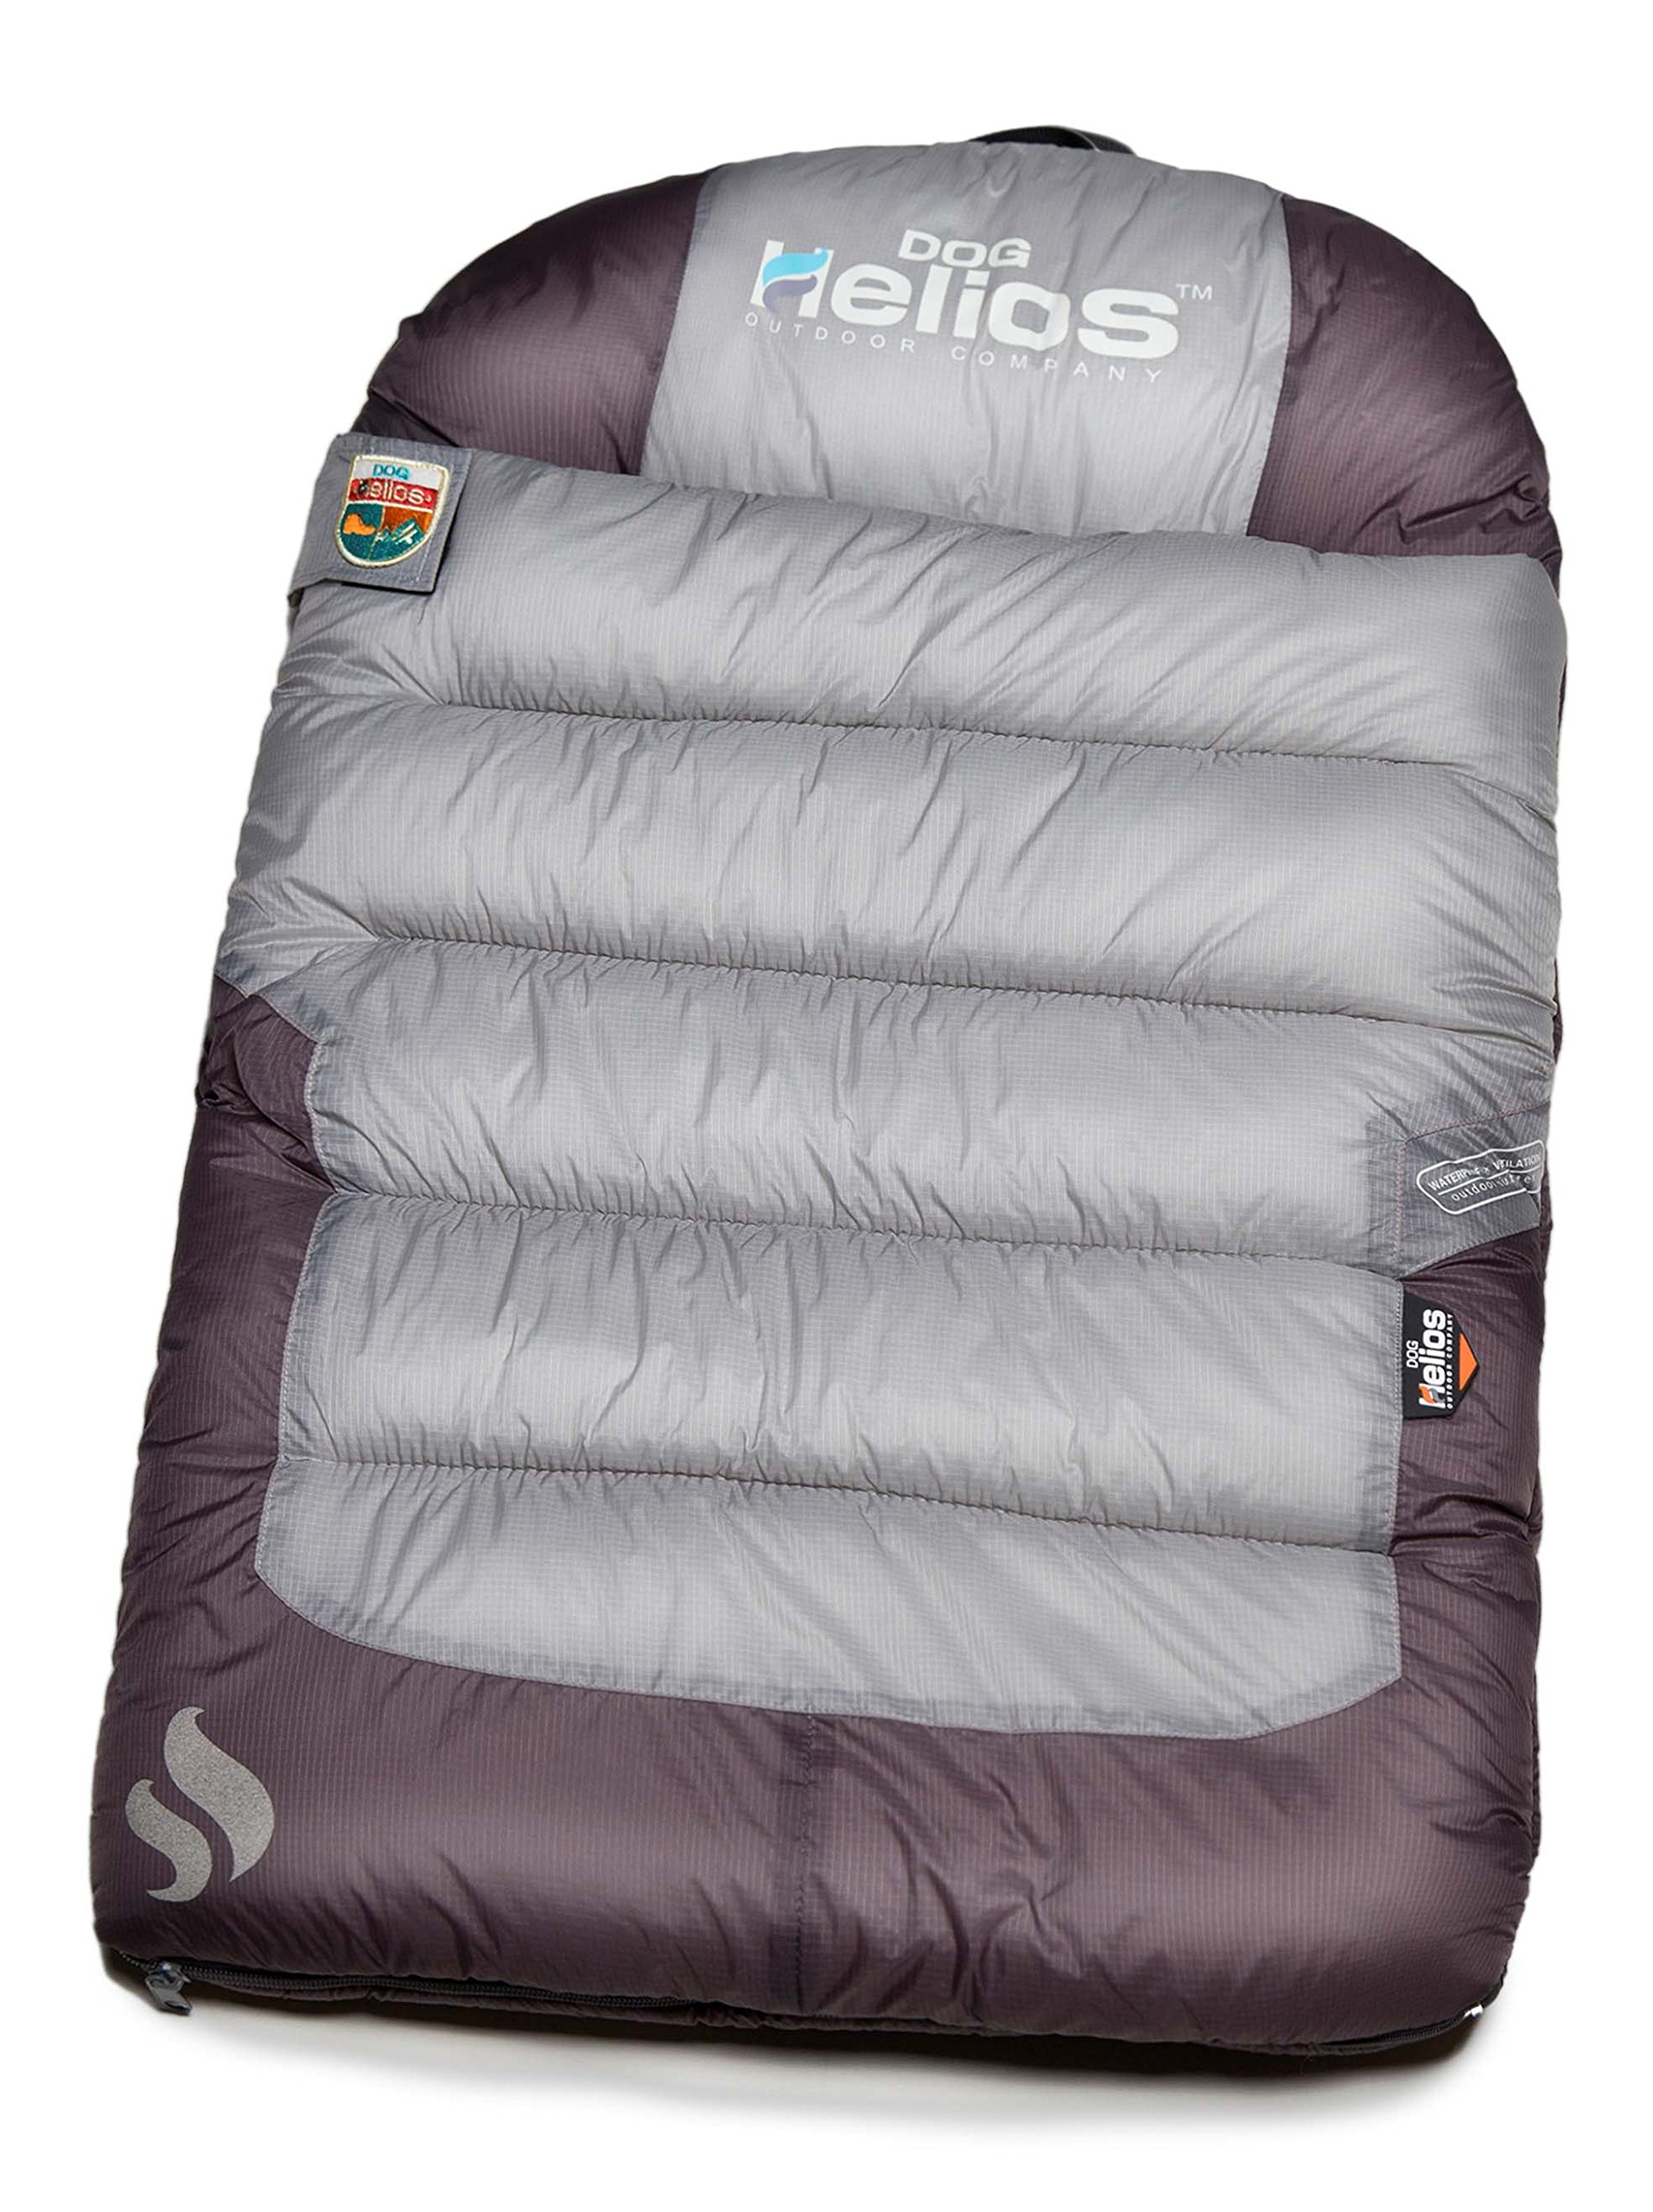 DogHelios Trail-Barker' Multi-Surface Water-Resistant Travel Camper Sleeper Pet Dog Bed Mat w/BlackShark Technology, One Size, Light Grey, Dark Grey